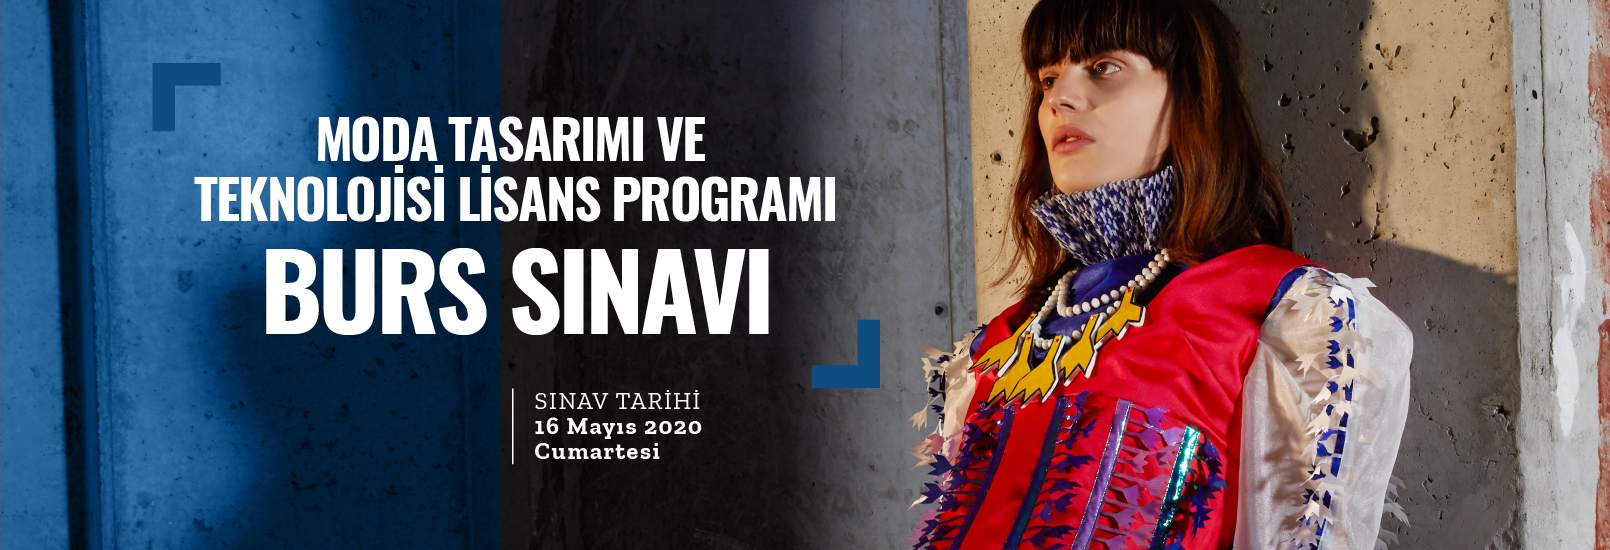 BURS SINAVI 16 MAYIS 2020